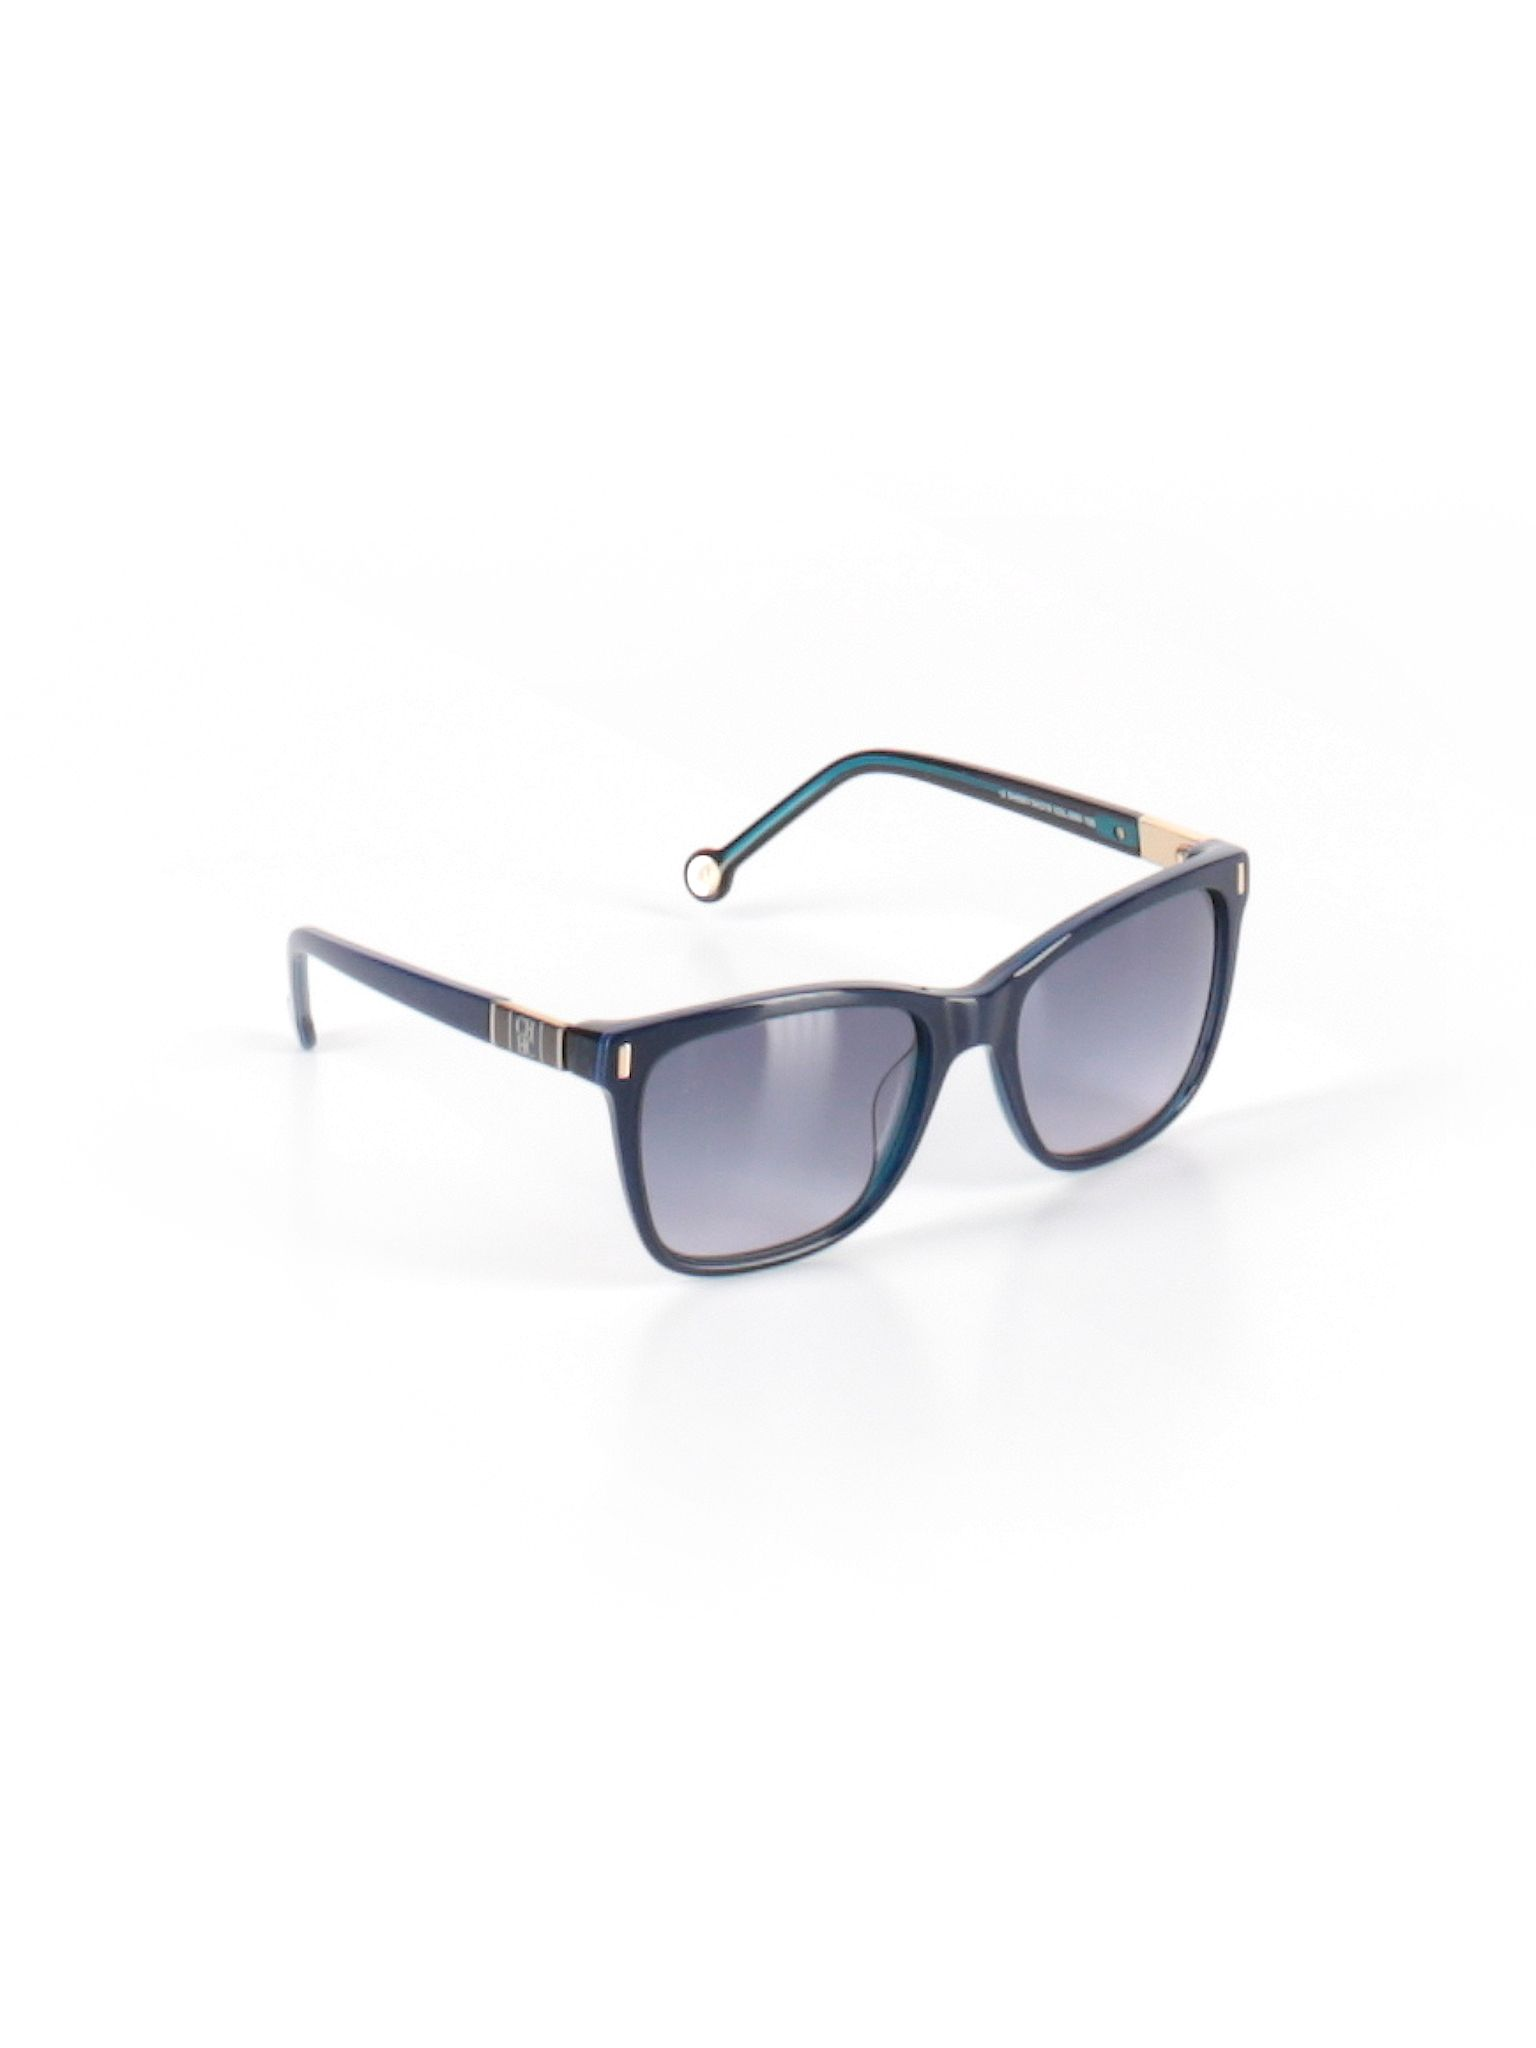 fc4c592327 CH Carolina Herrera Sunglasses  Dark Blue Women s Accessories - 30140130